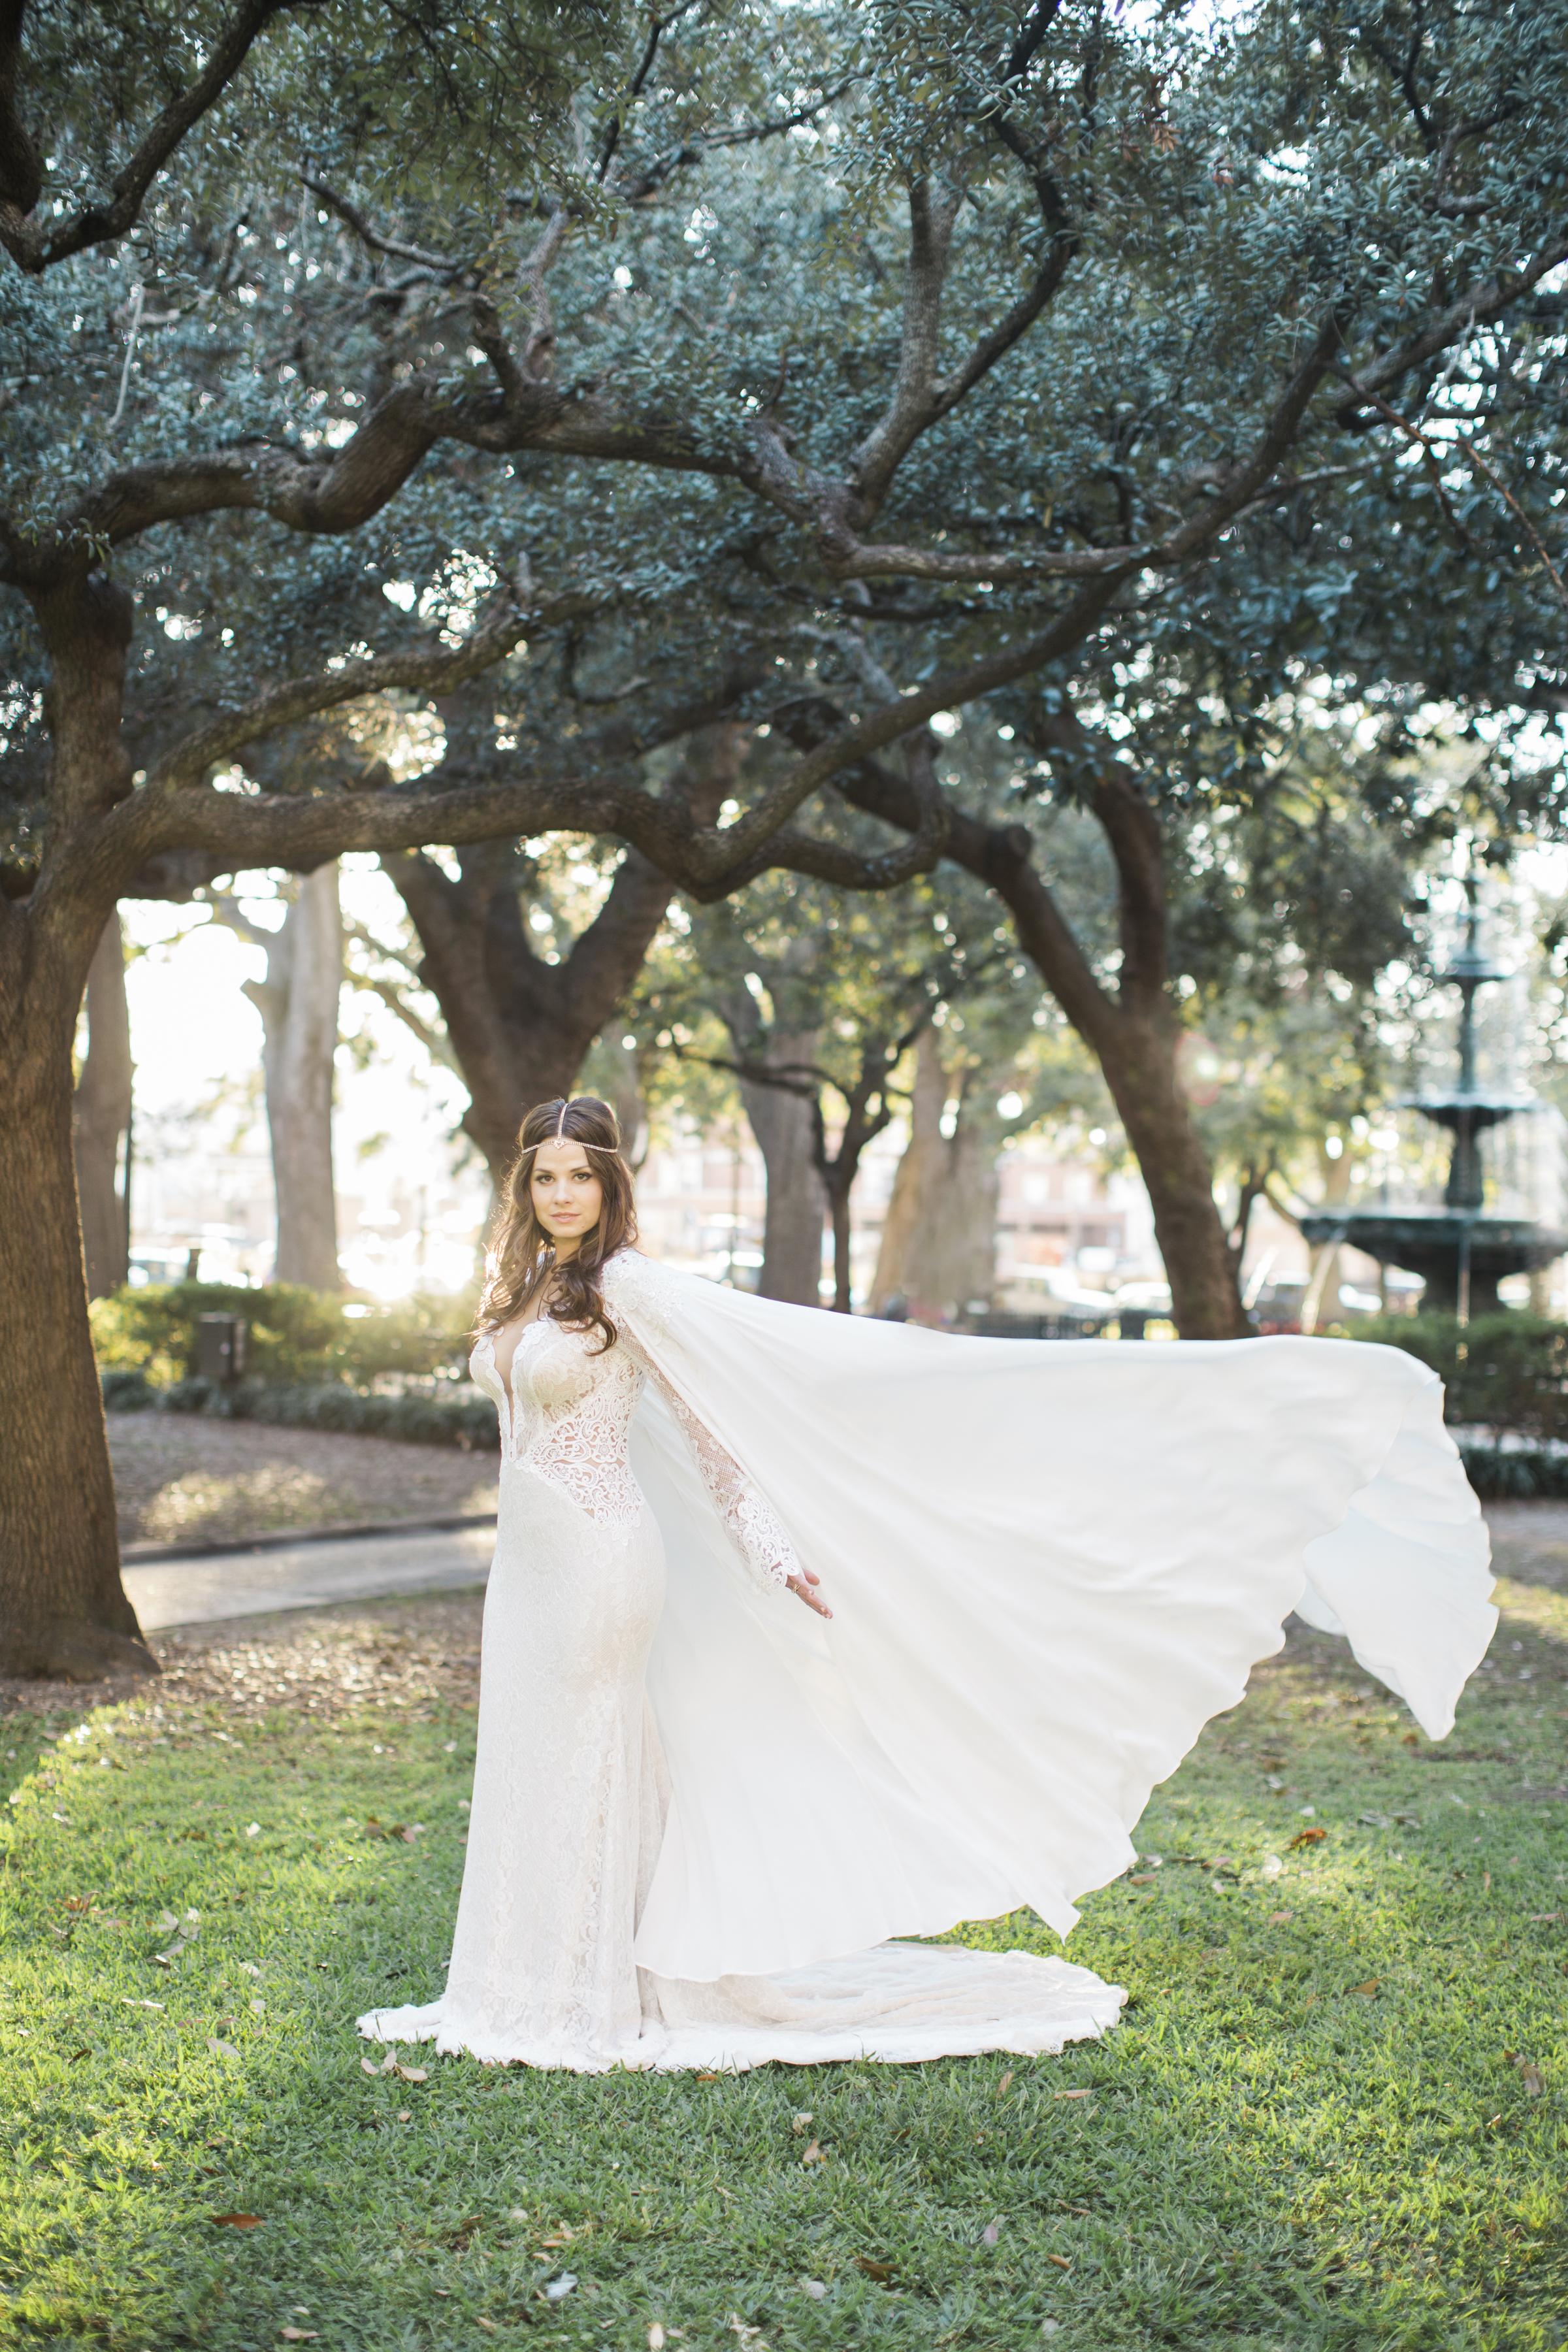 17_destination wedding photographer.jpg